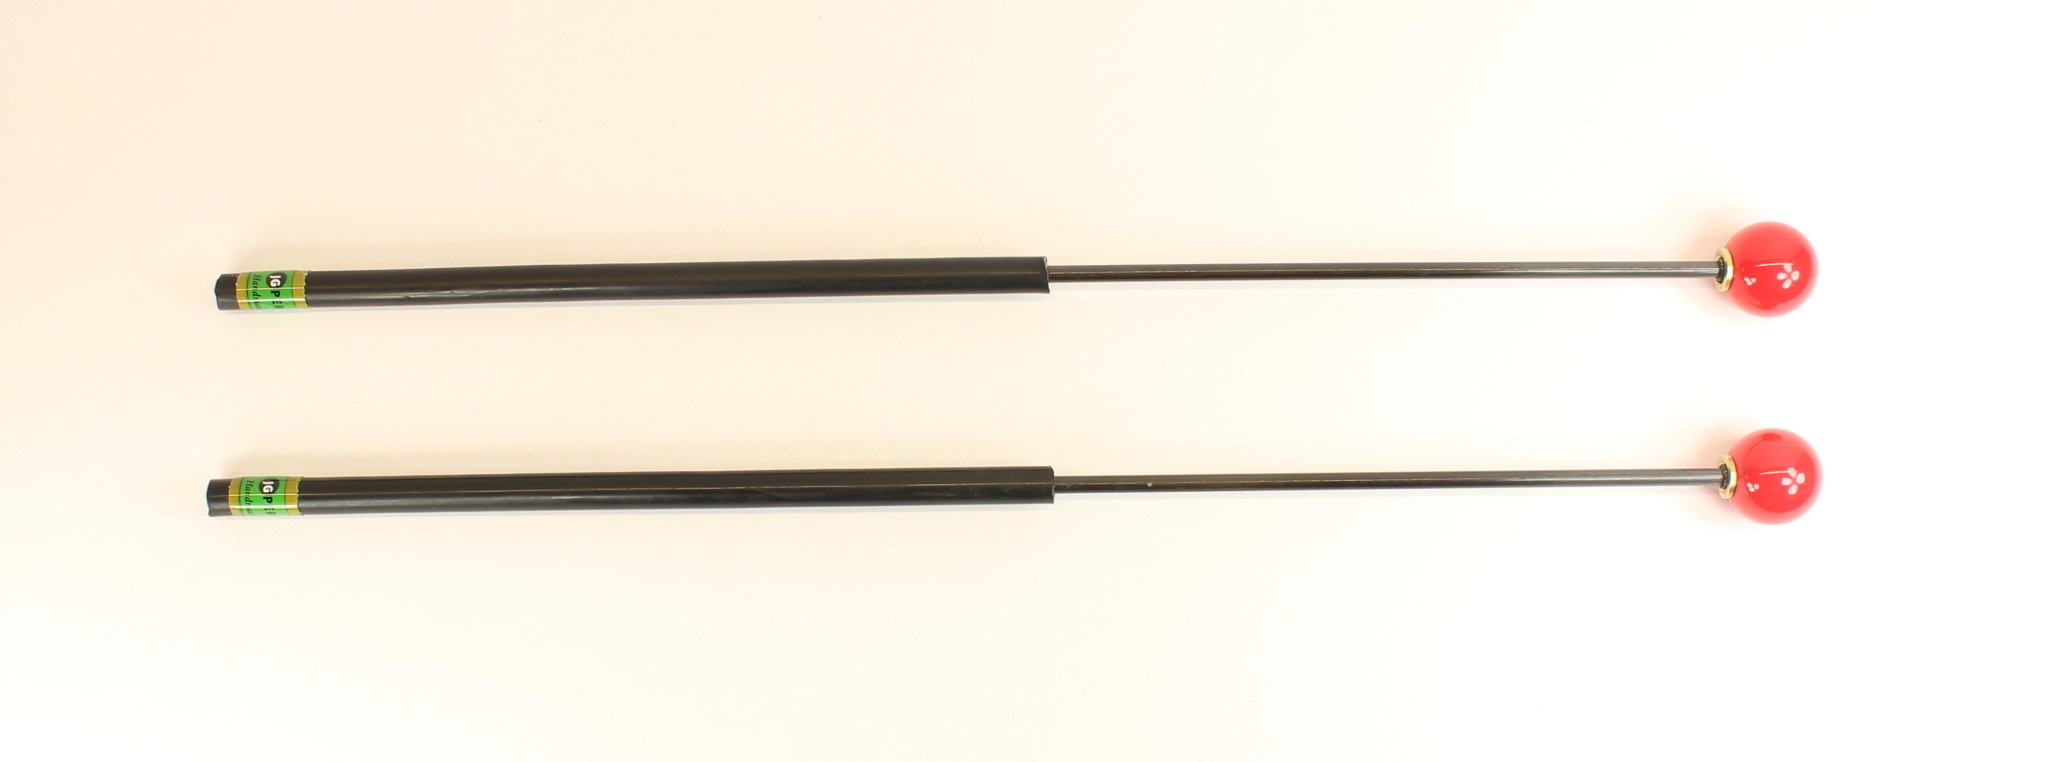 JG Percussion Baguettes JG K10 Phenolic with brass insert